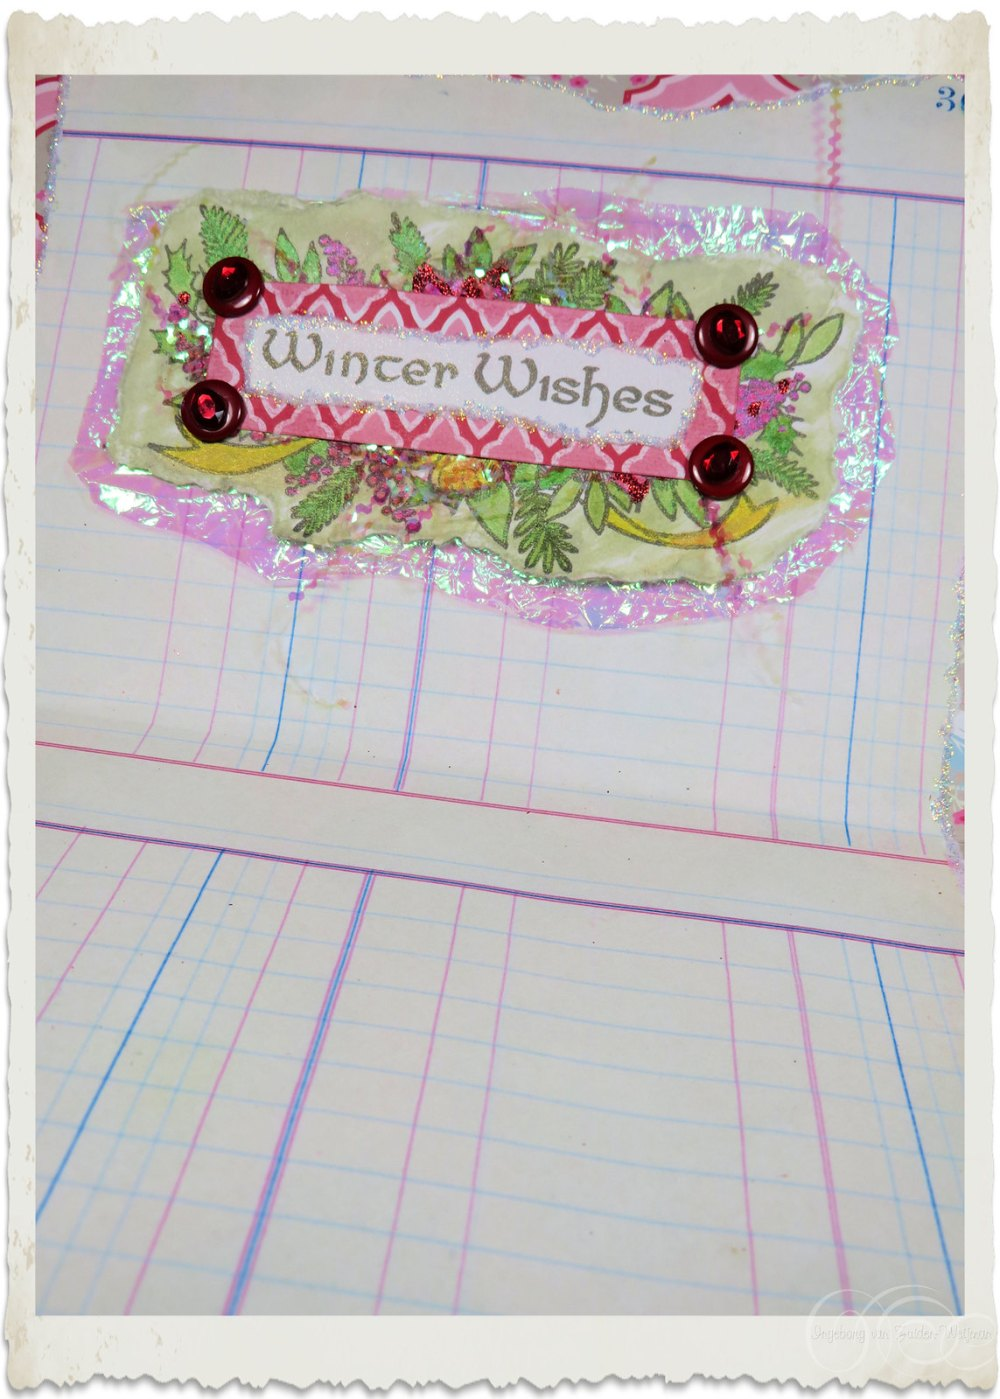 Details of inside wordart on handmade Christmas card